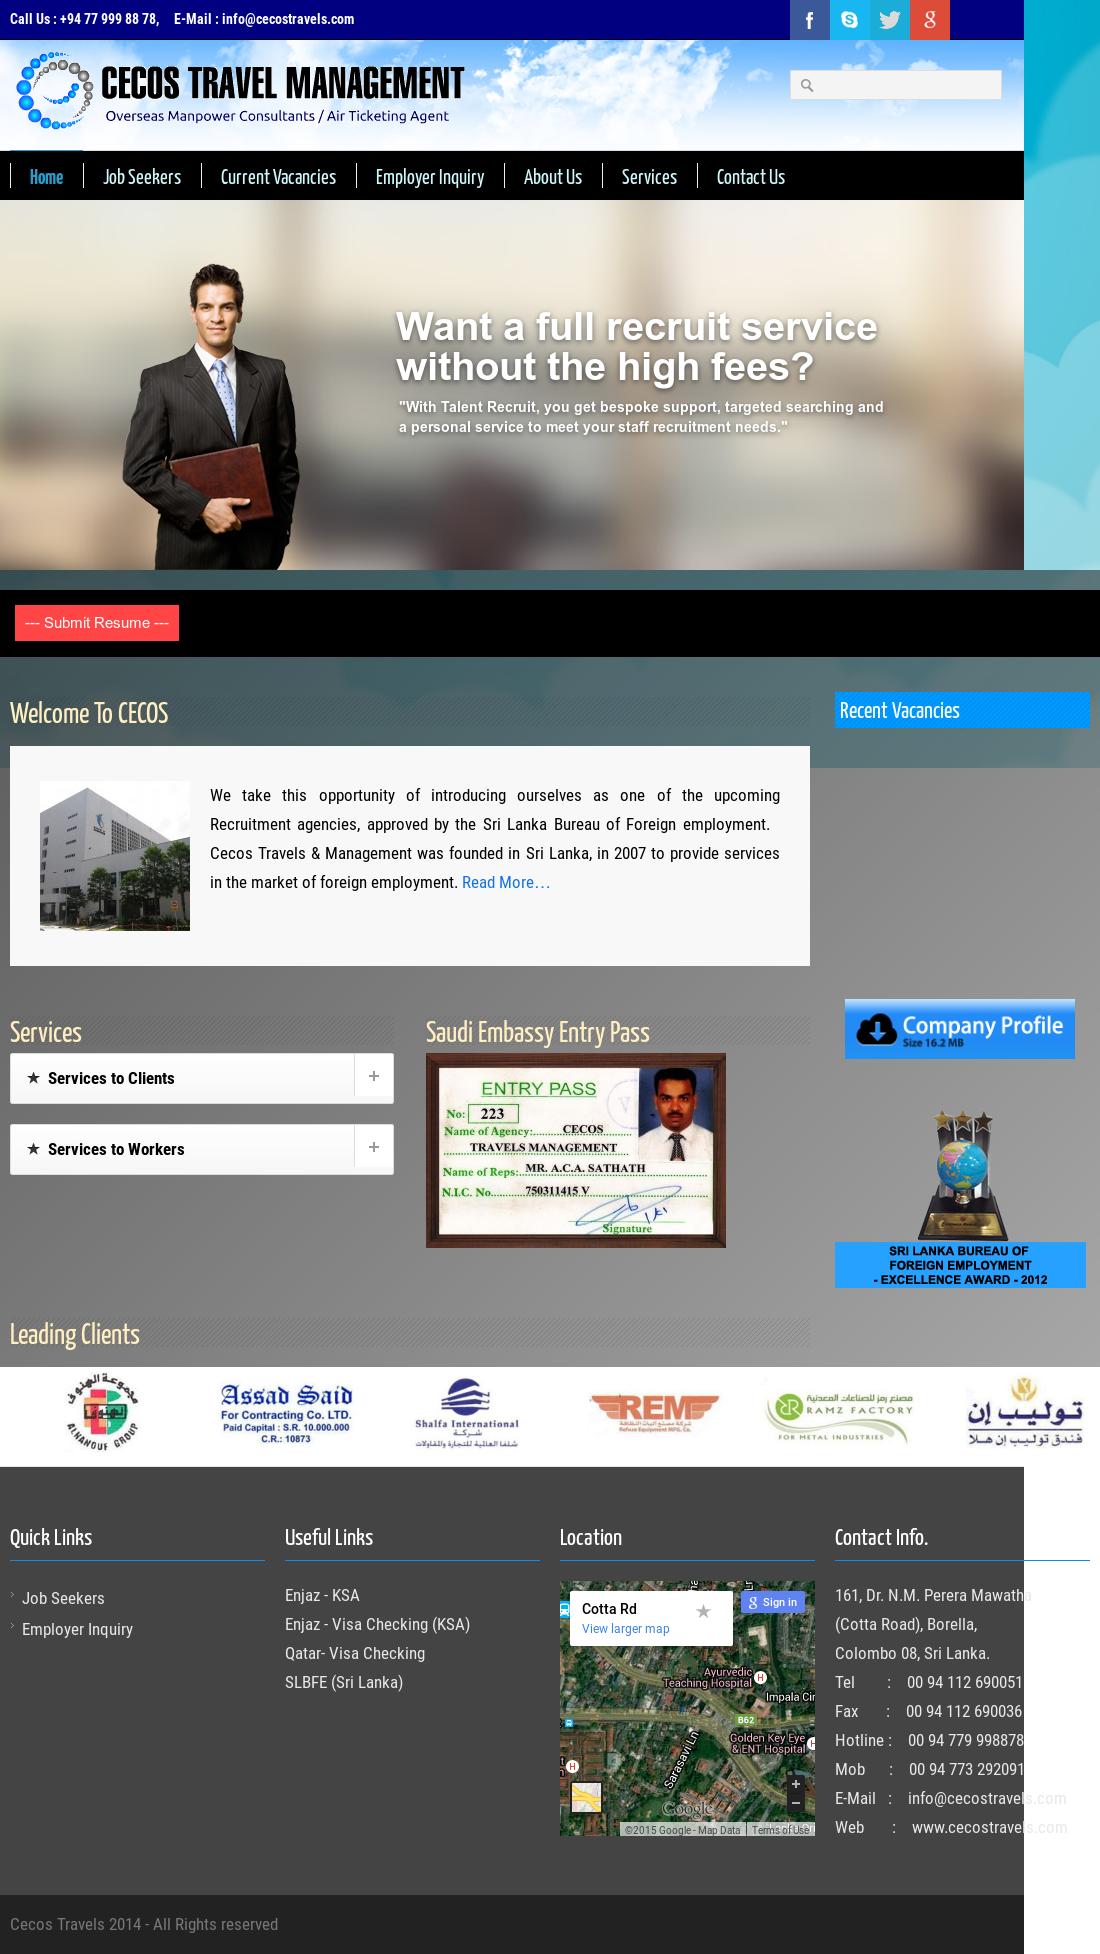 Cecos Travels Management website history Cecos Travels